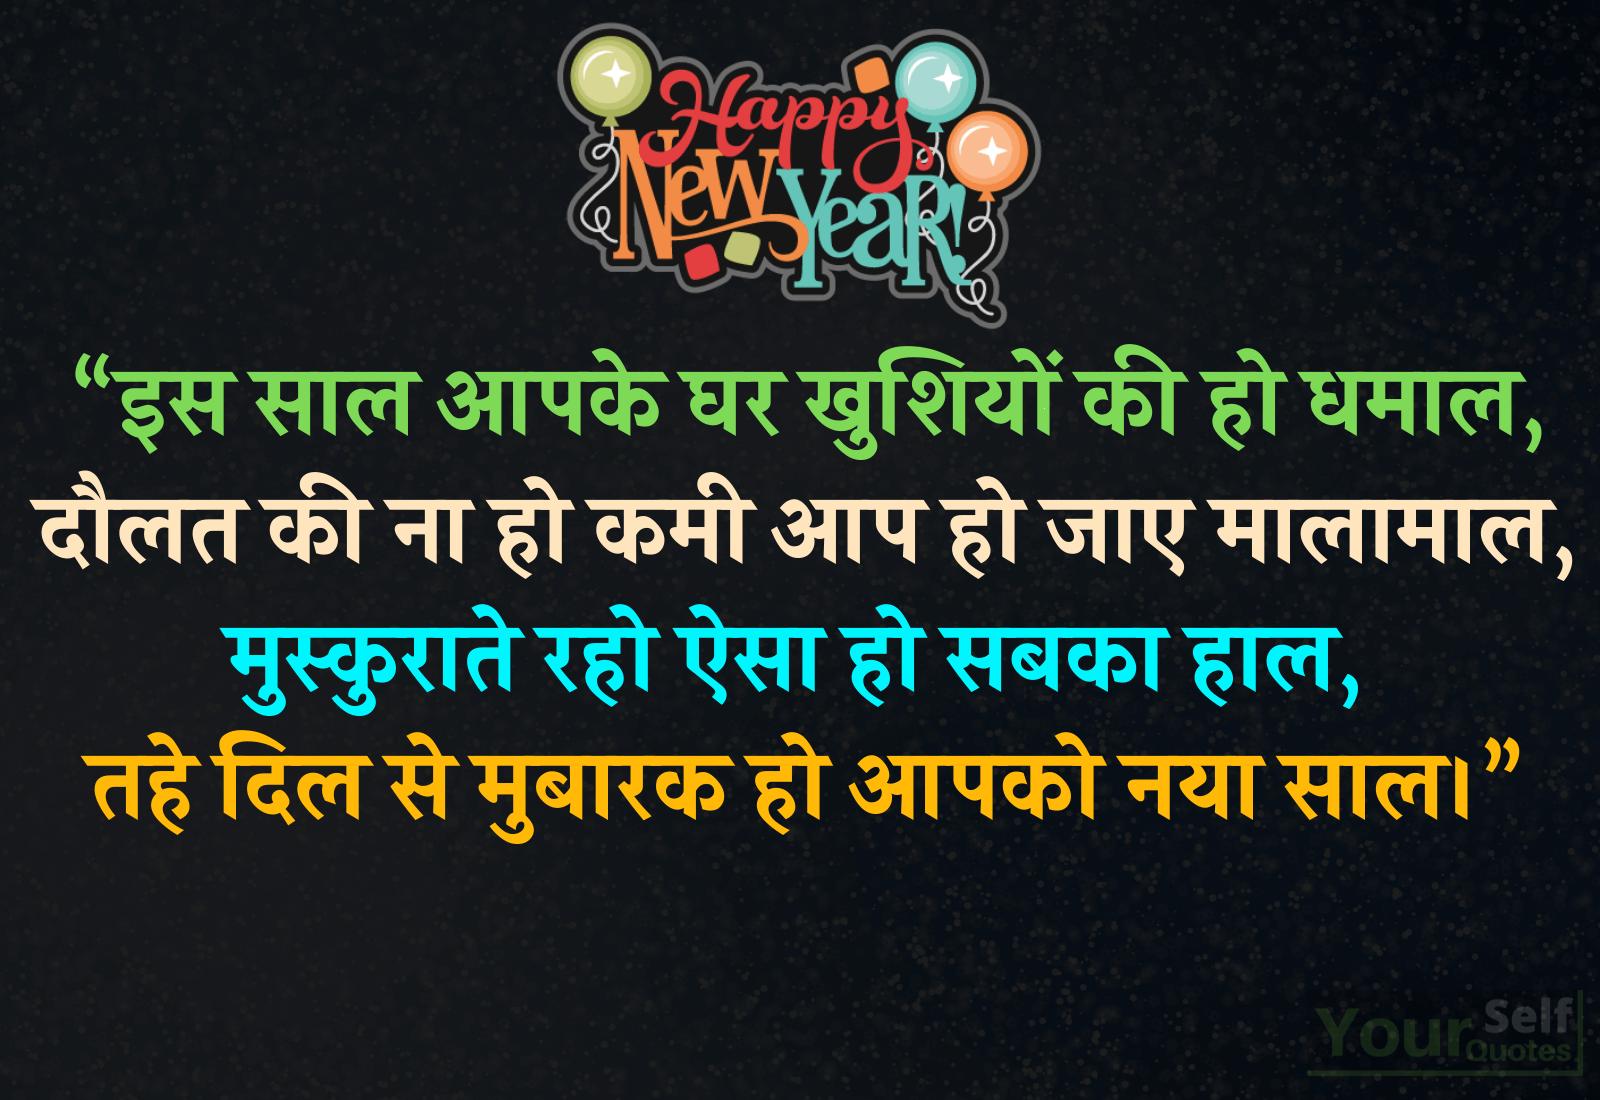 Best New Year Hindi Shayari Wallpaper